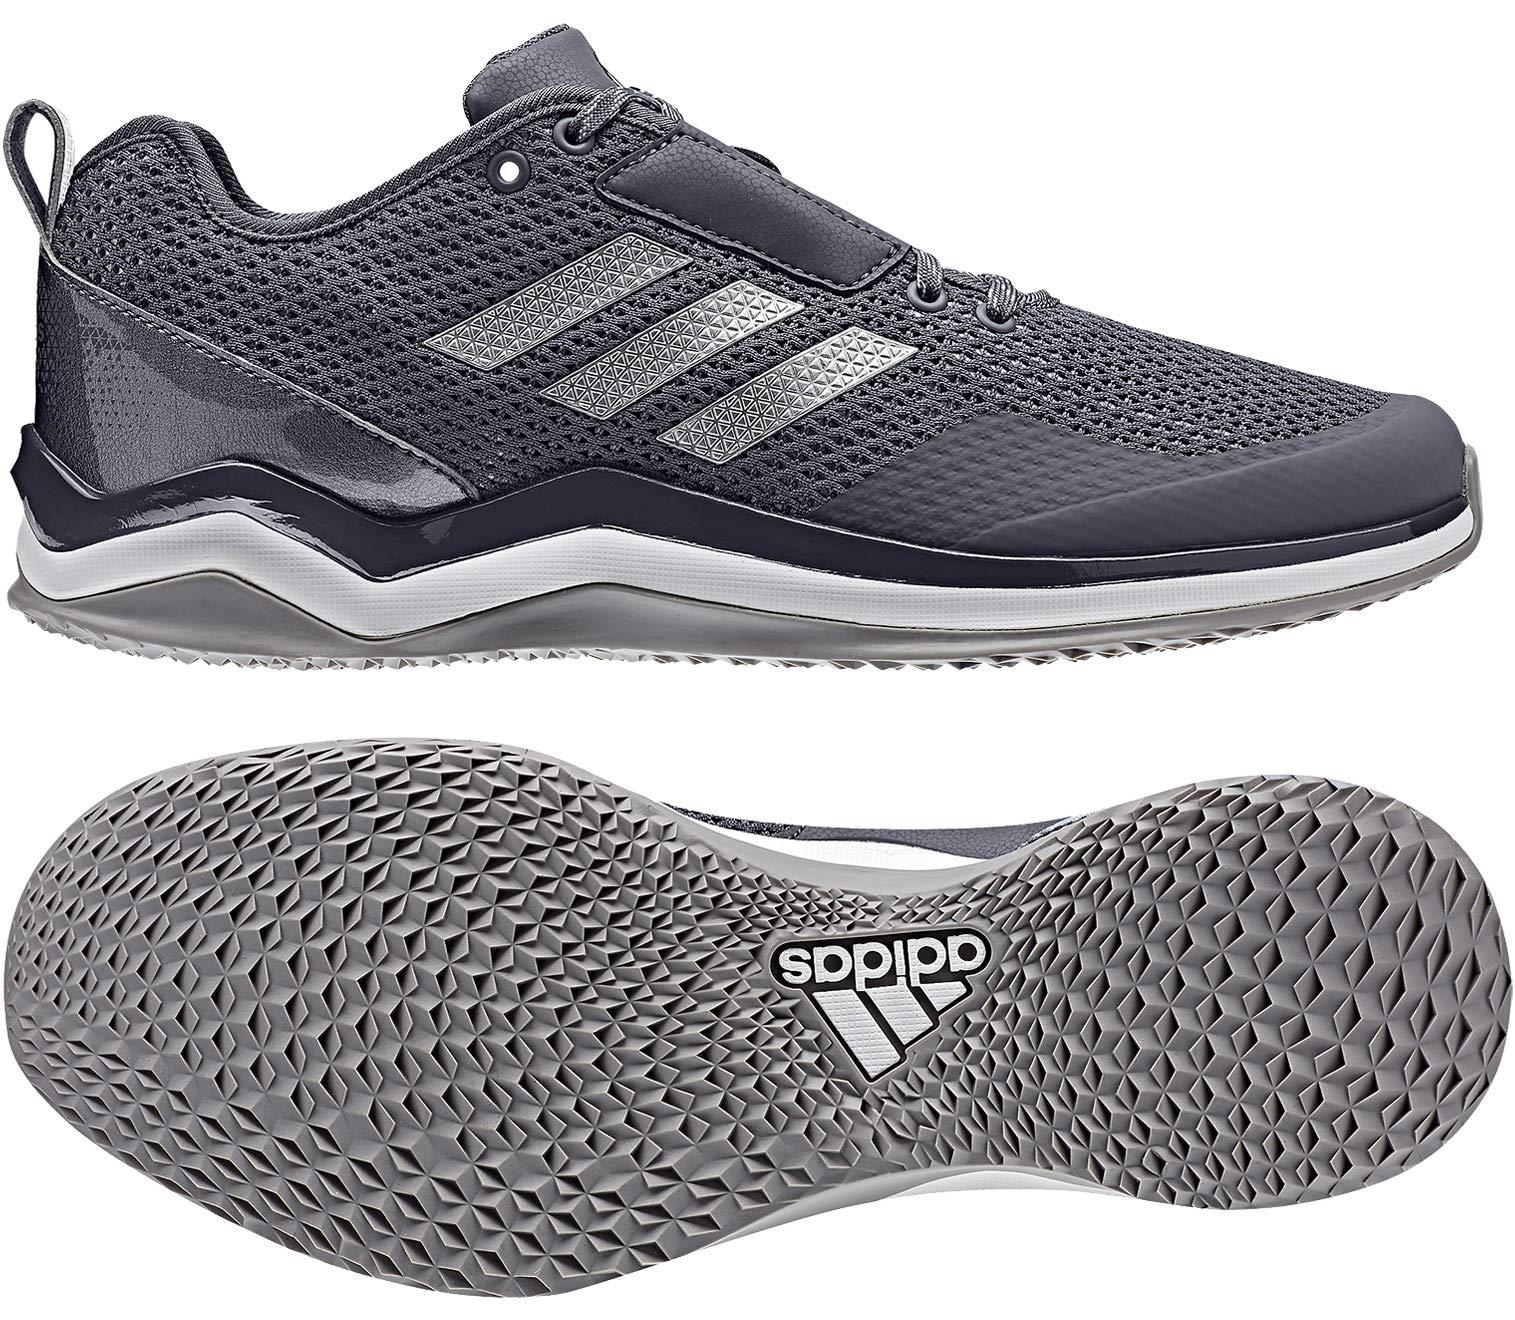 sale retailer 09b34 4cf75 Galleon - Adidas Men s Speed Trainer 3, Onix Metallic Silver White, (9.5 M  US)